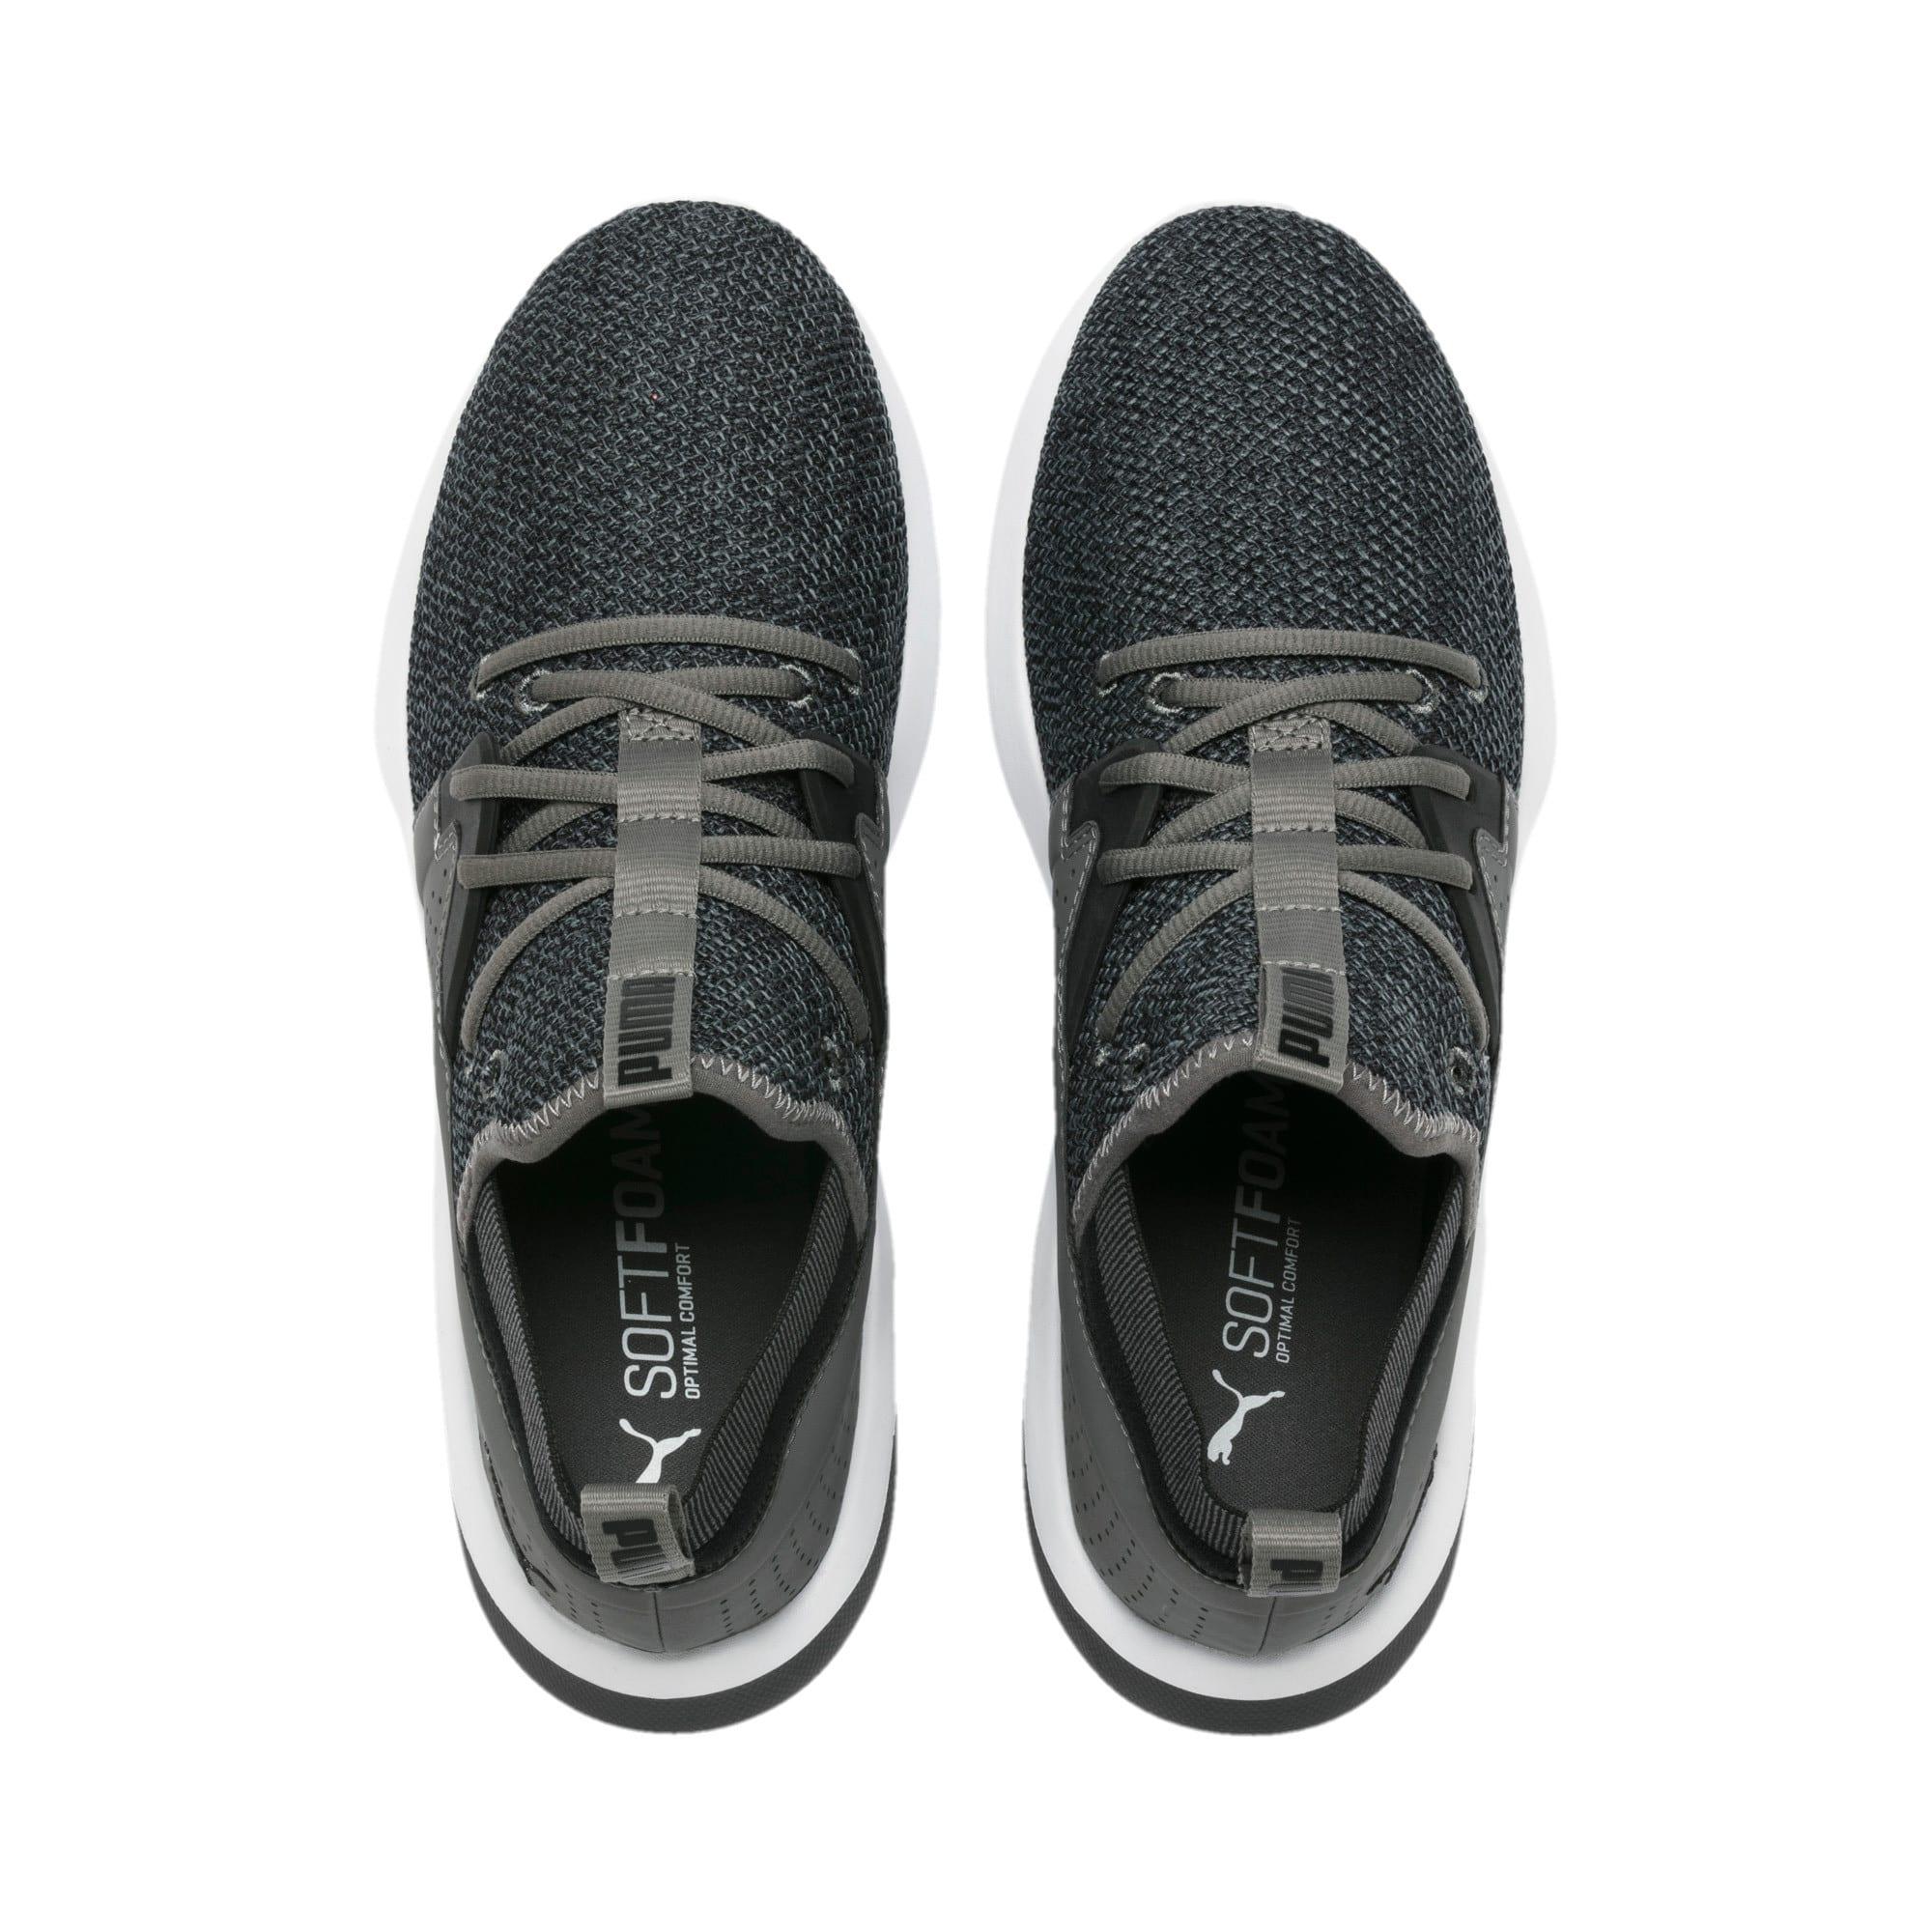 Thumbnail 8 of Emergence Men's Running Shoes, CASTLEROCK-Puma Black, medium-IND